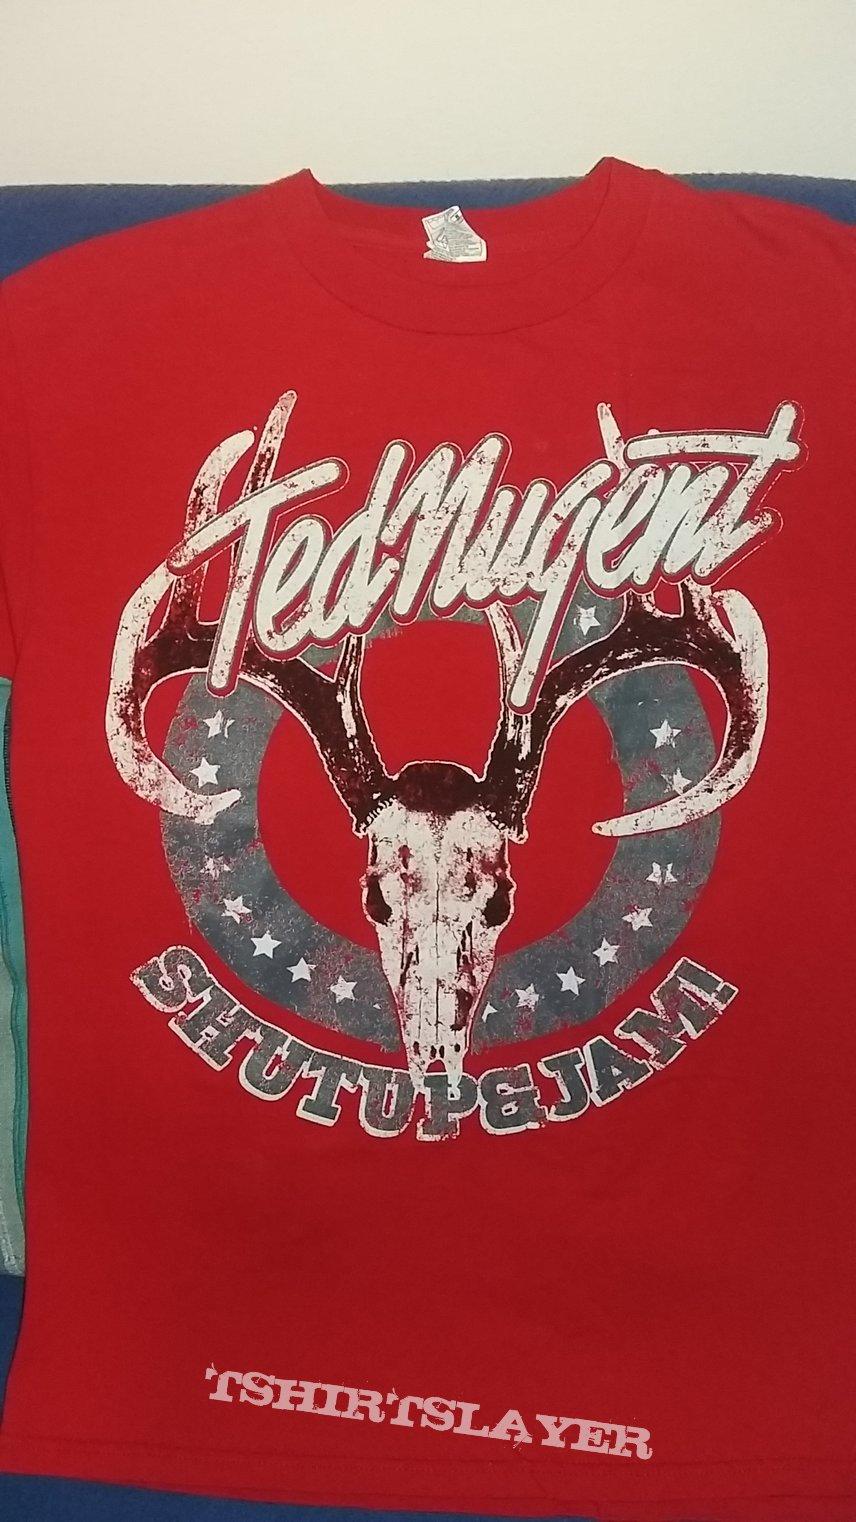 Ted Nugent - Shut Up & Jam Tour 2014